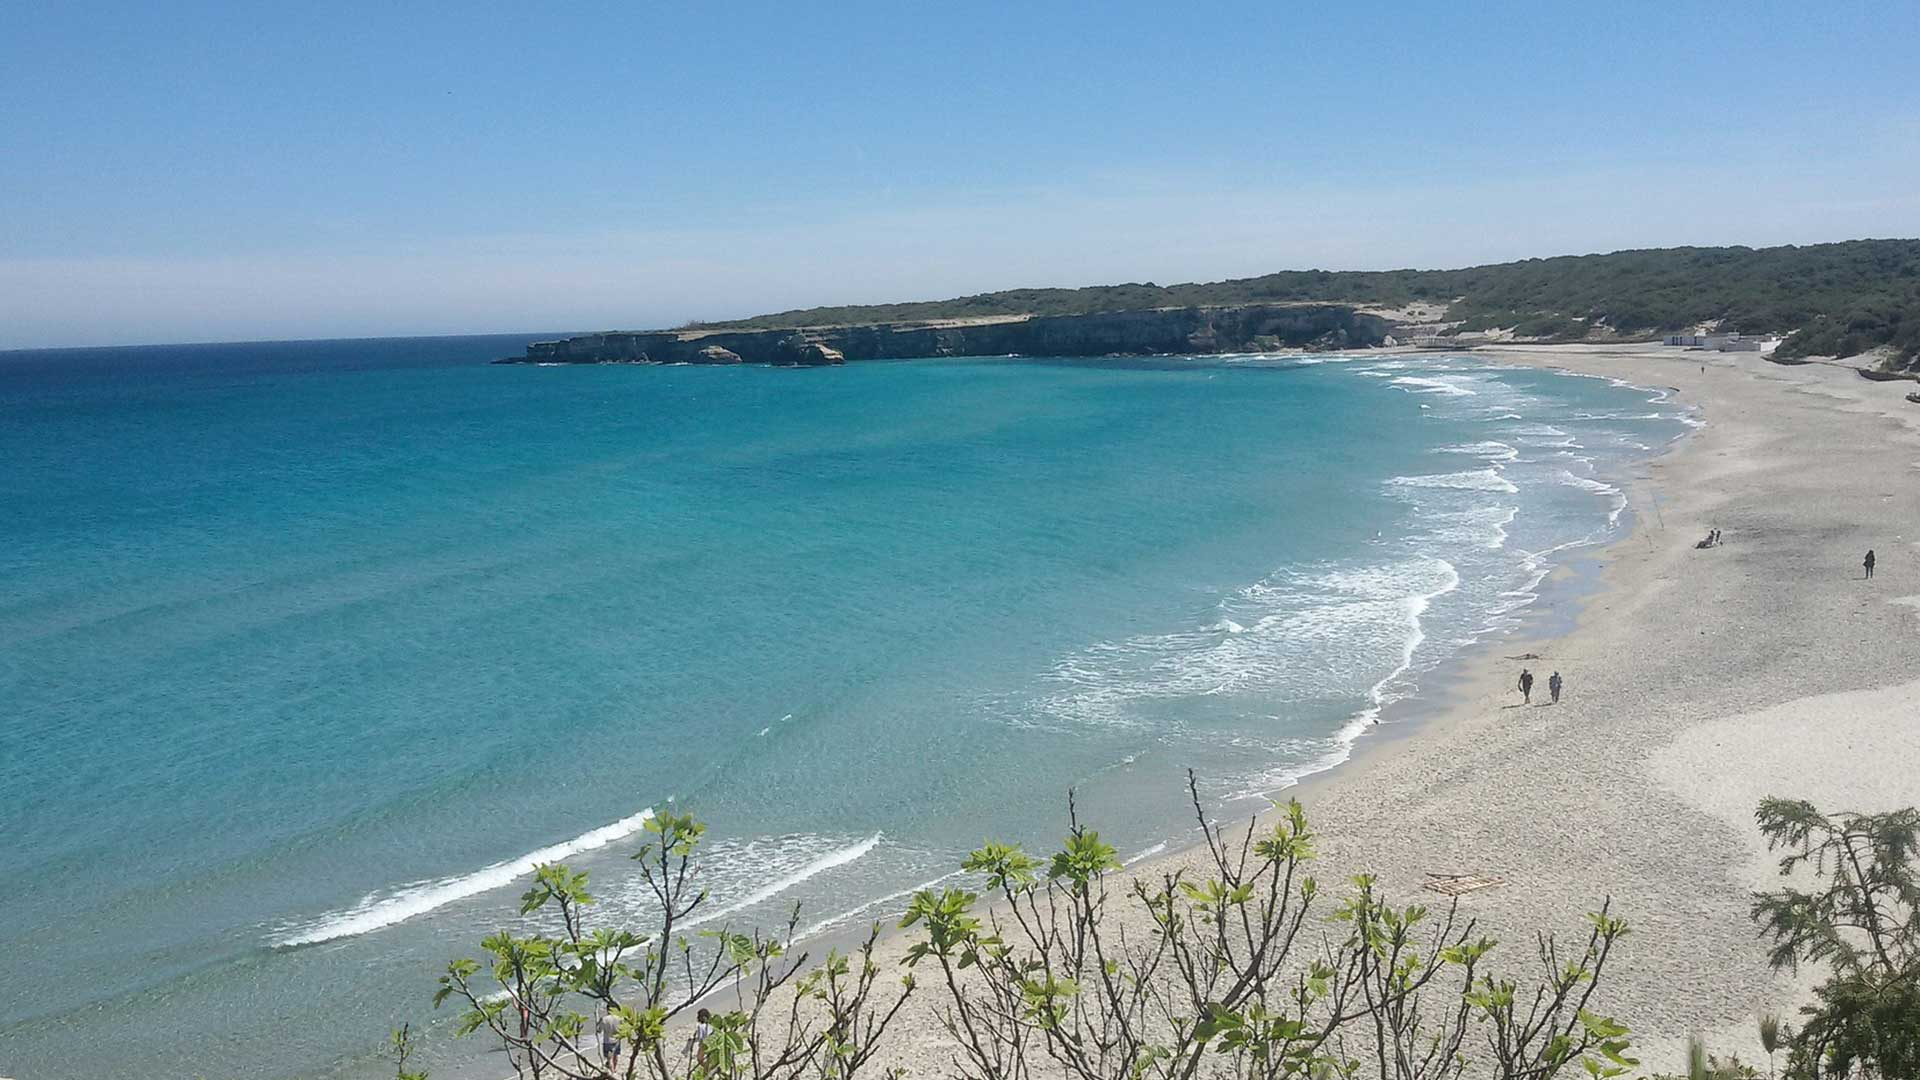 Mare-Adriatico